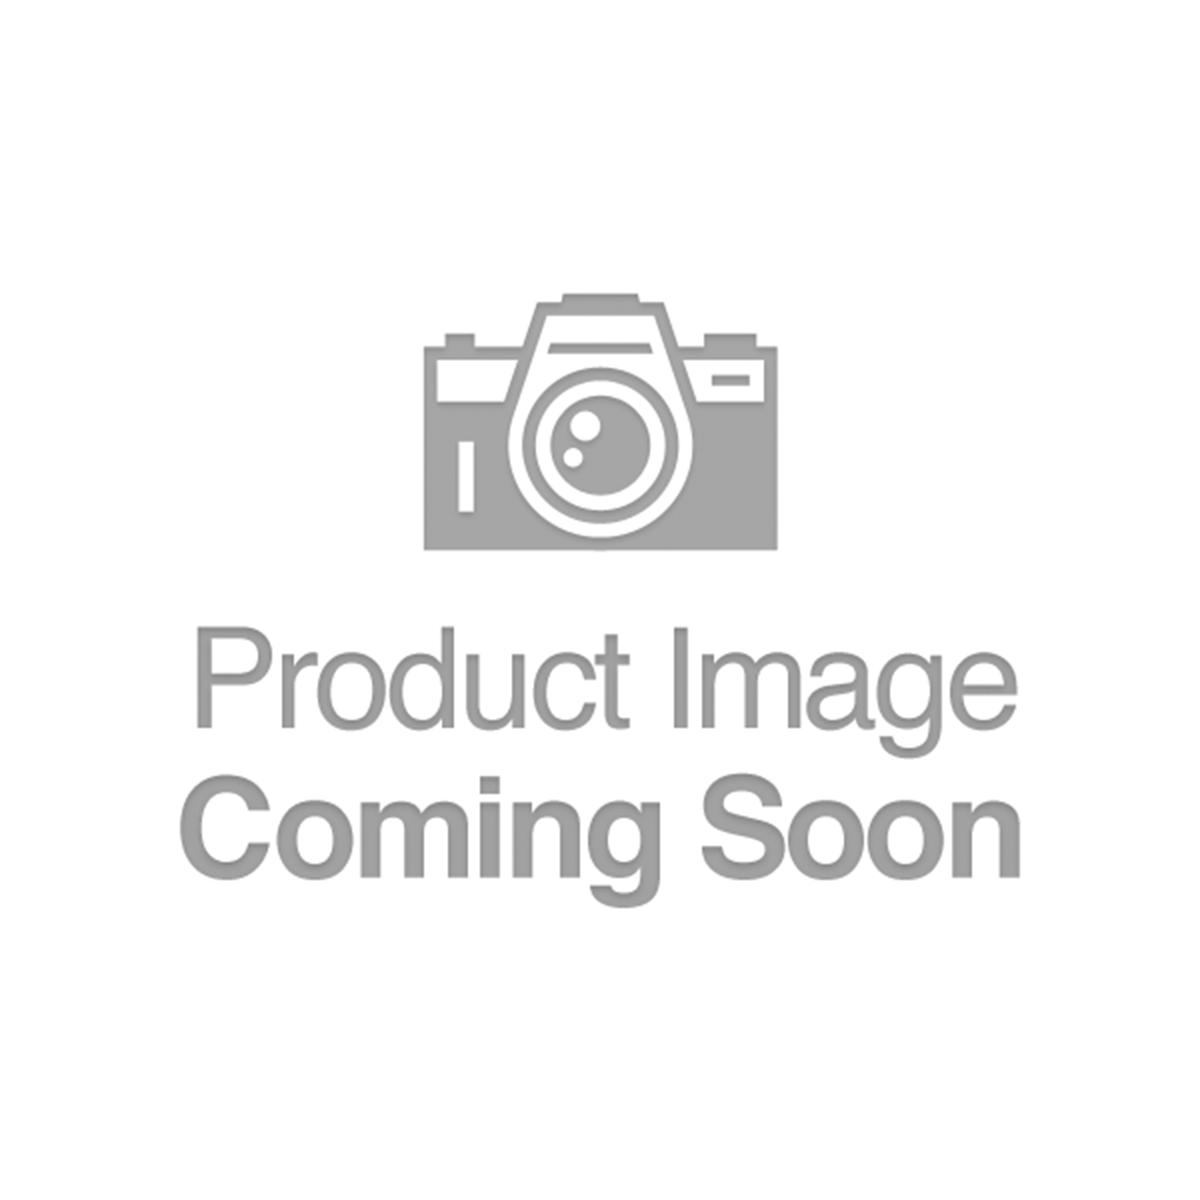 FR. CT-194  1 Shilling June 7, 1776  PCGS 66 PPQ